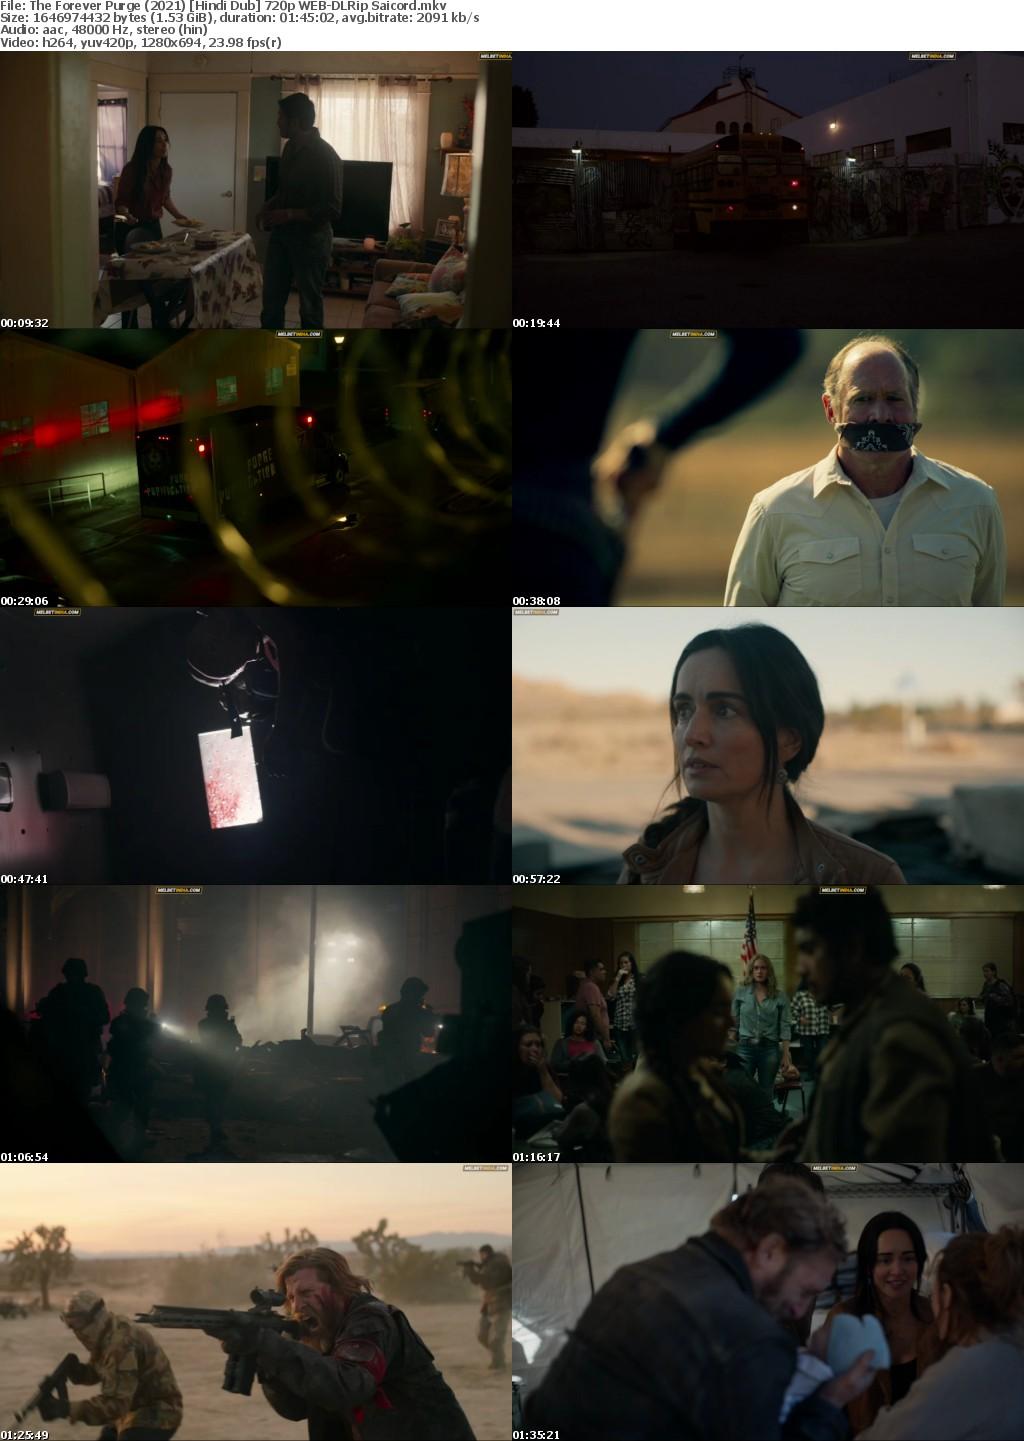 The Forever Purge (2021) Hindi Dub 720p WEB-DLRip Saicord